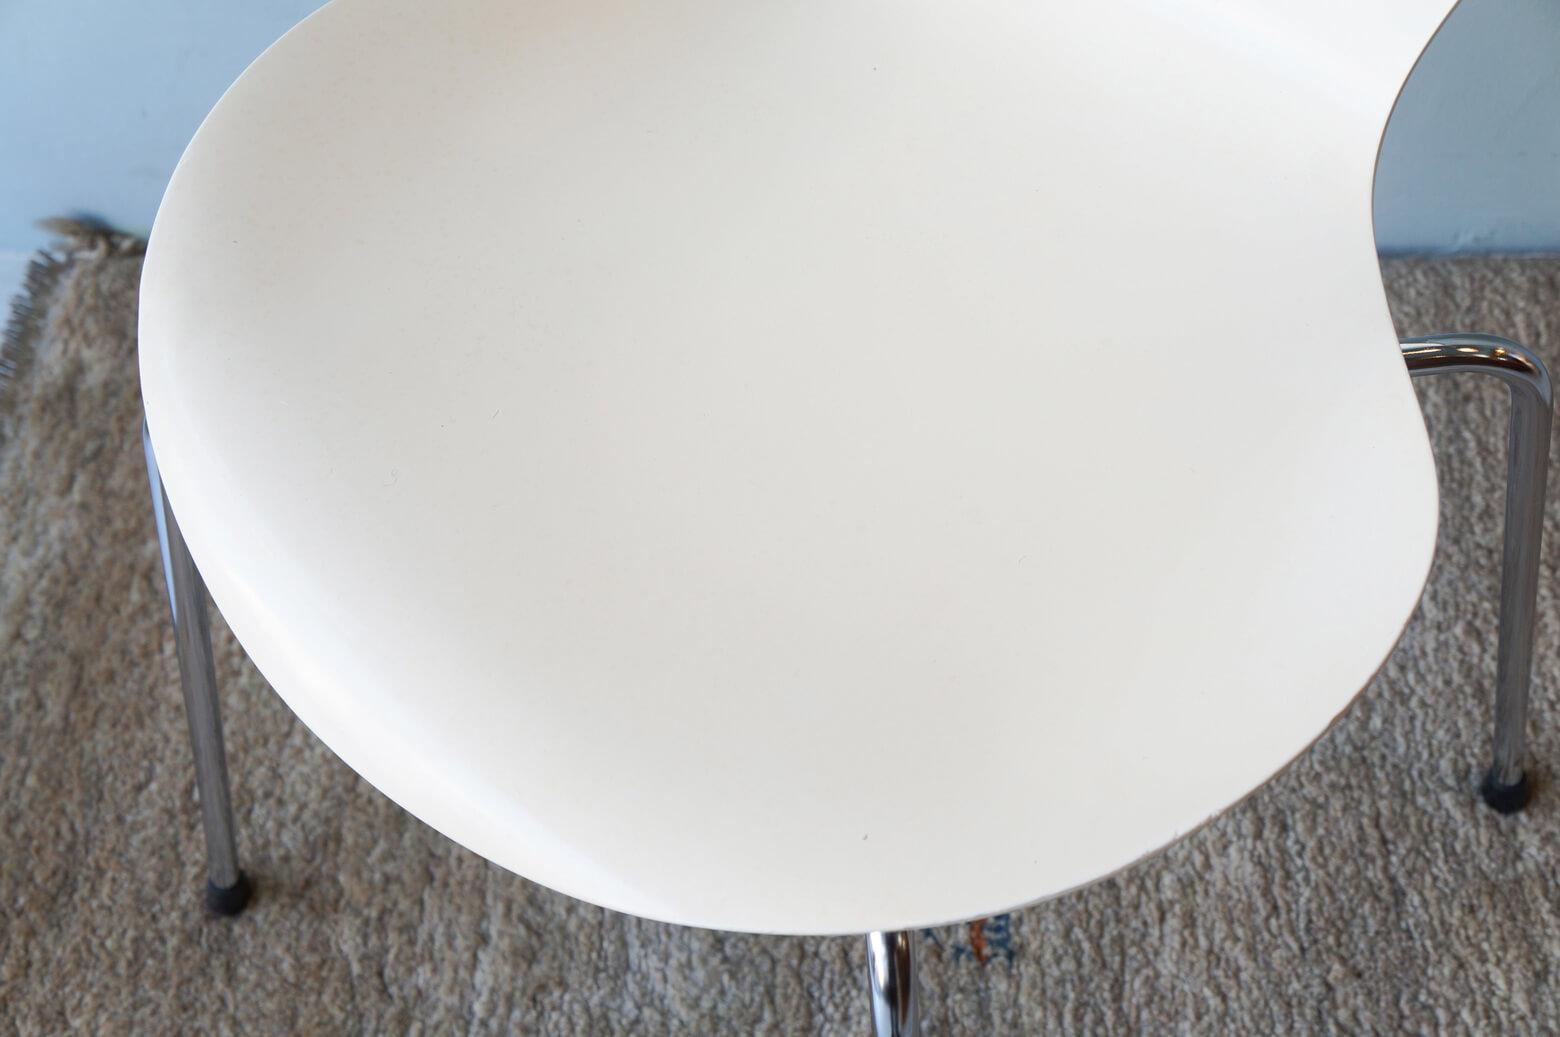 Fritz Hansen Series 7 Chair Arne Jacobsen/フリッツハンセン セブンチェア ホワイト アルネ・ヤコブセン 北欧ヴィンテージ 椅子 1